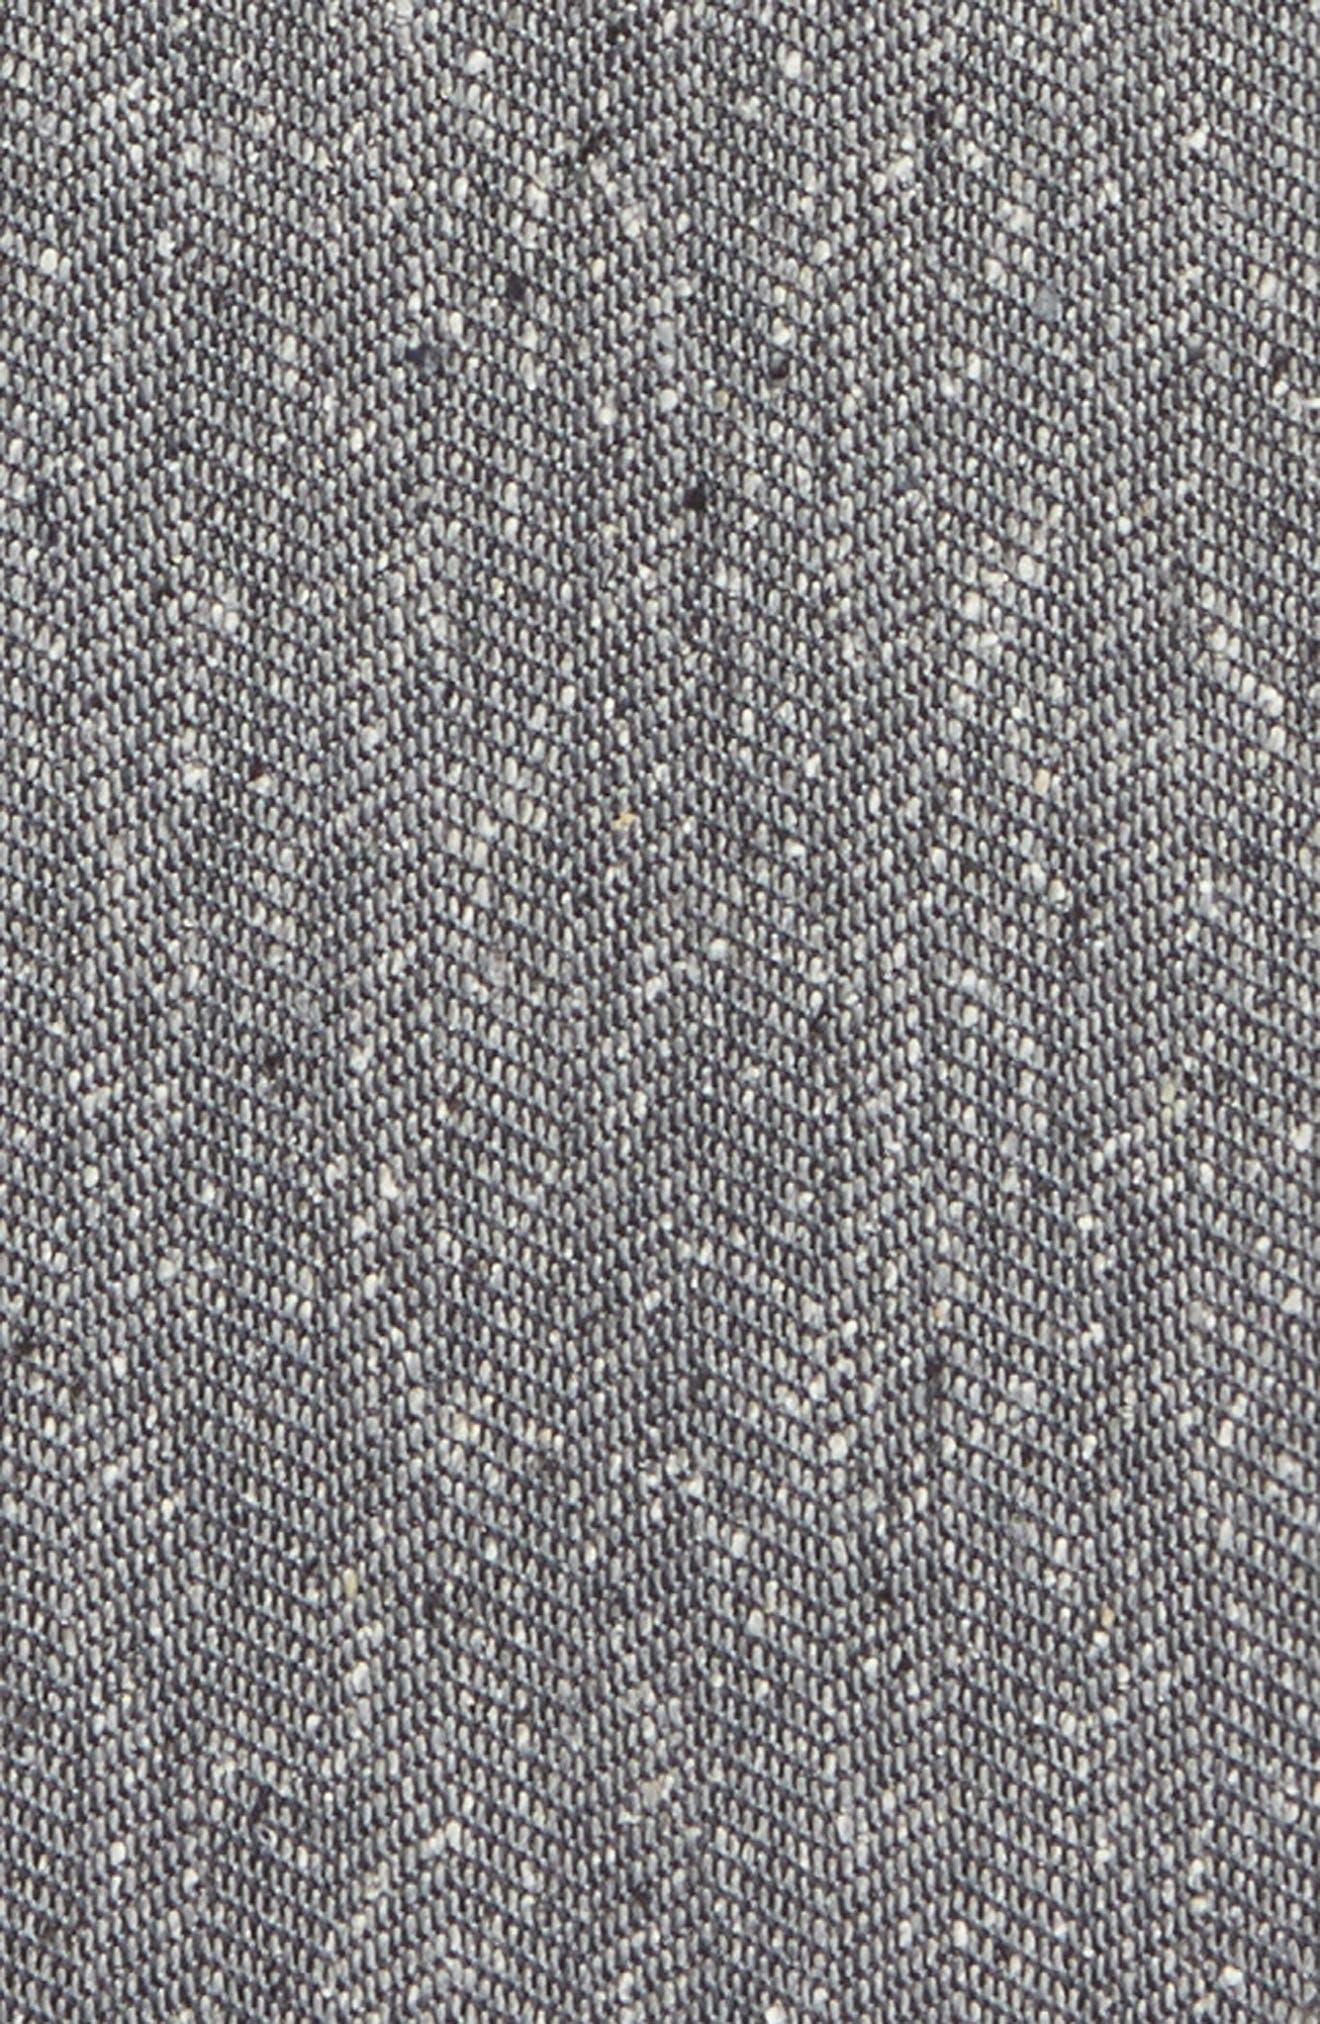 Threaded Zigzag Silk Pocket Square,                             Alternate thumbnail 7, color,